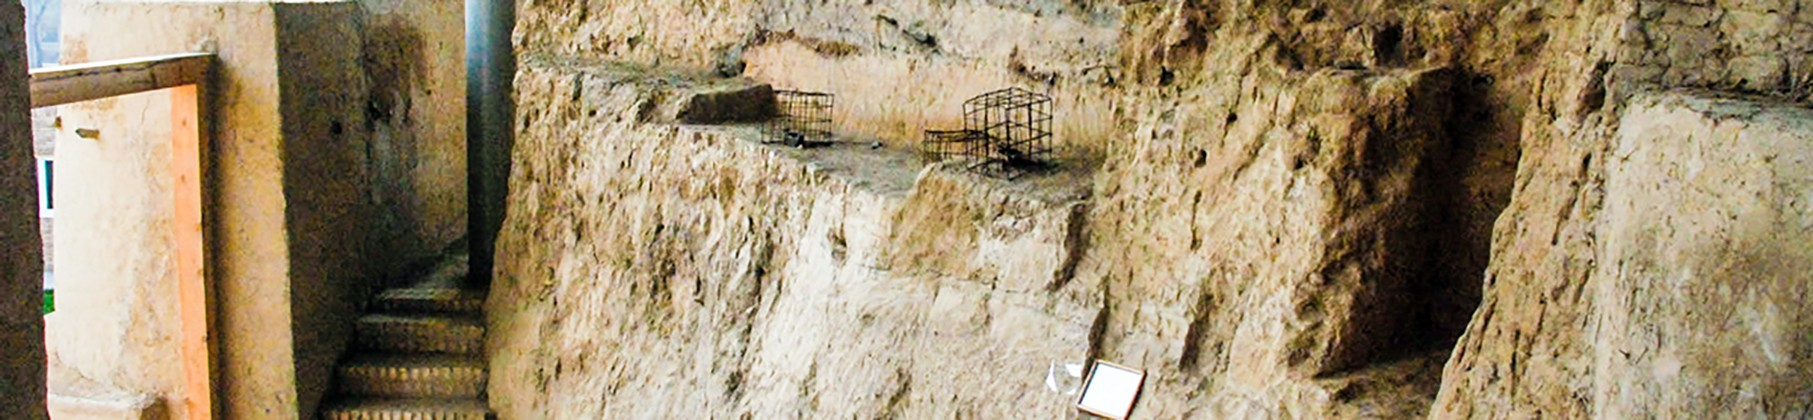 Ming Urik Ruins - 1